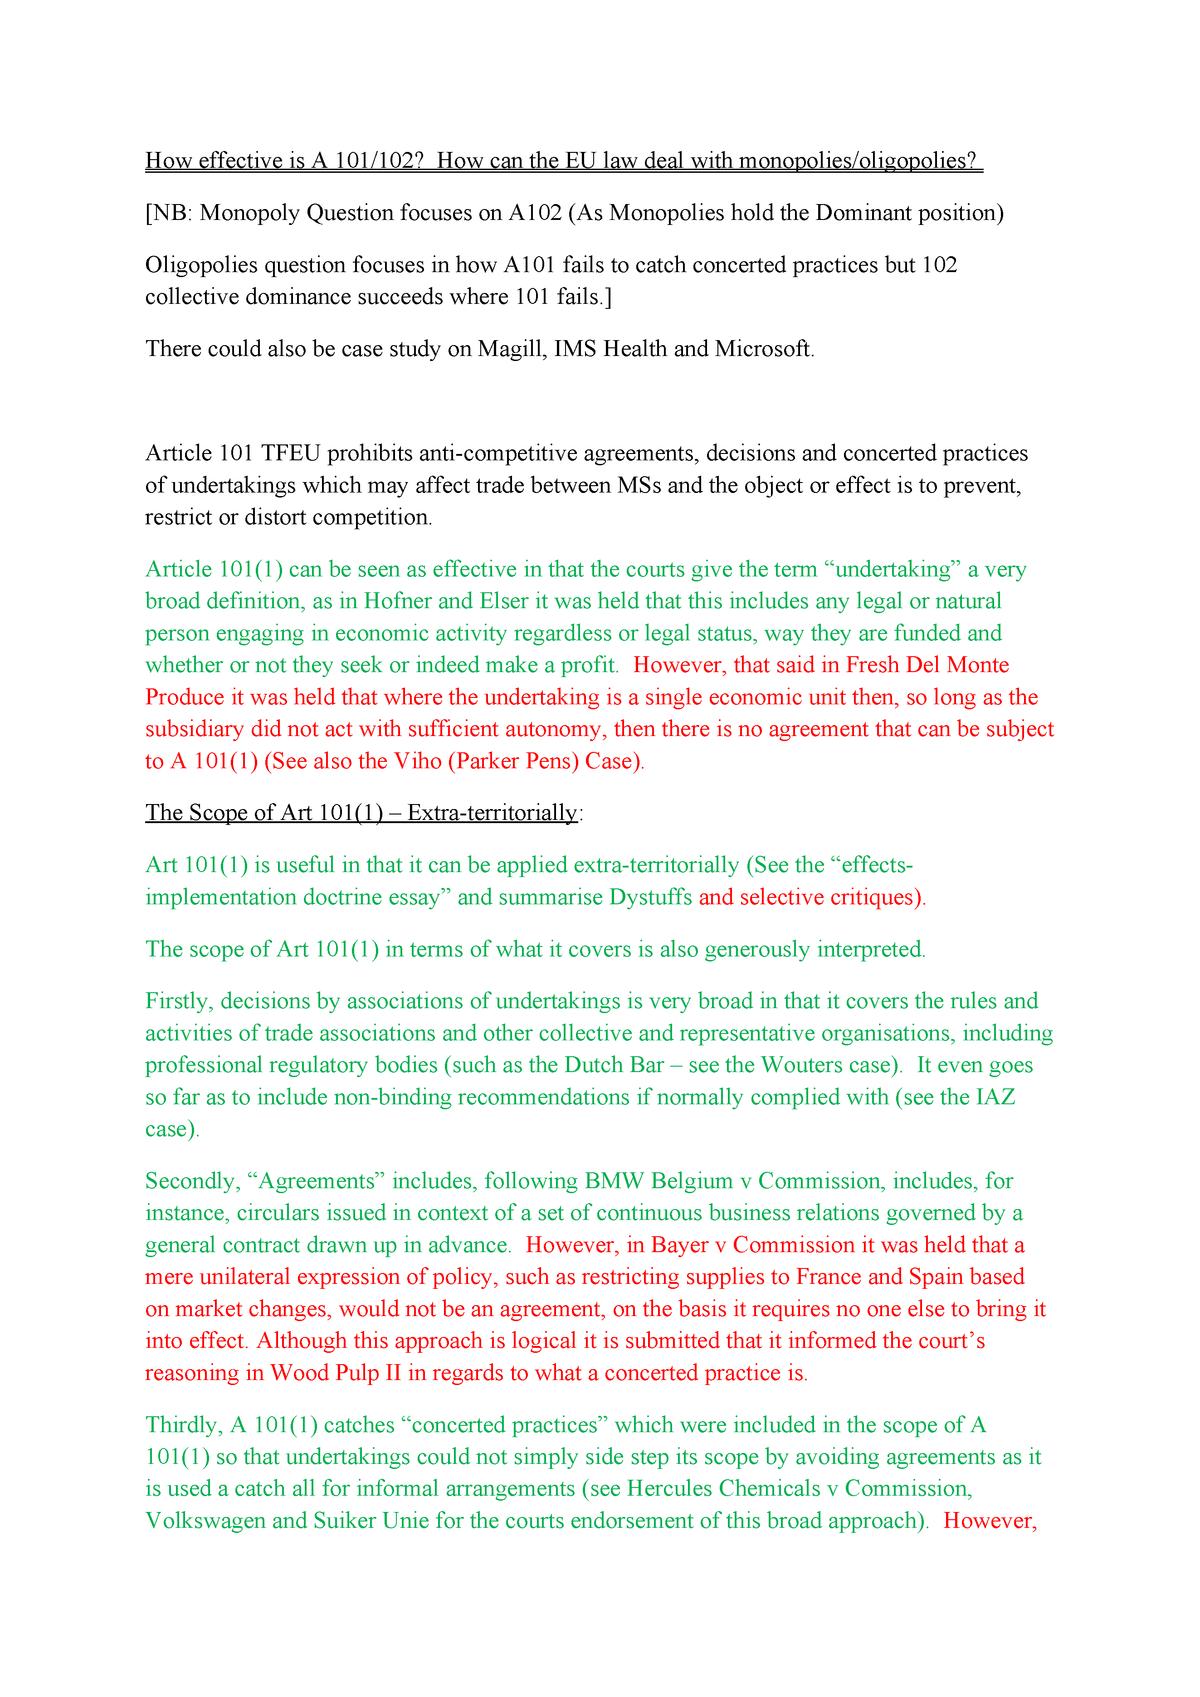 Essay, Effectiveness of 101-102, Dealing With Oligopolies